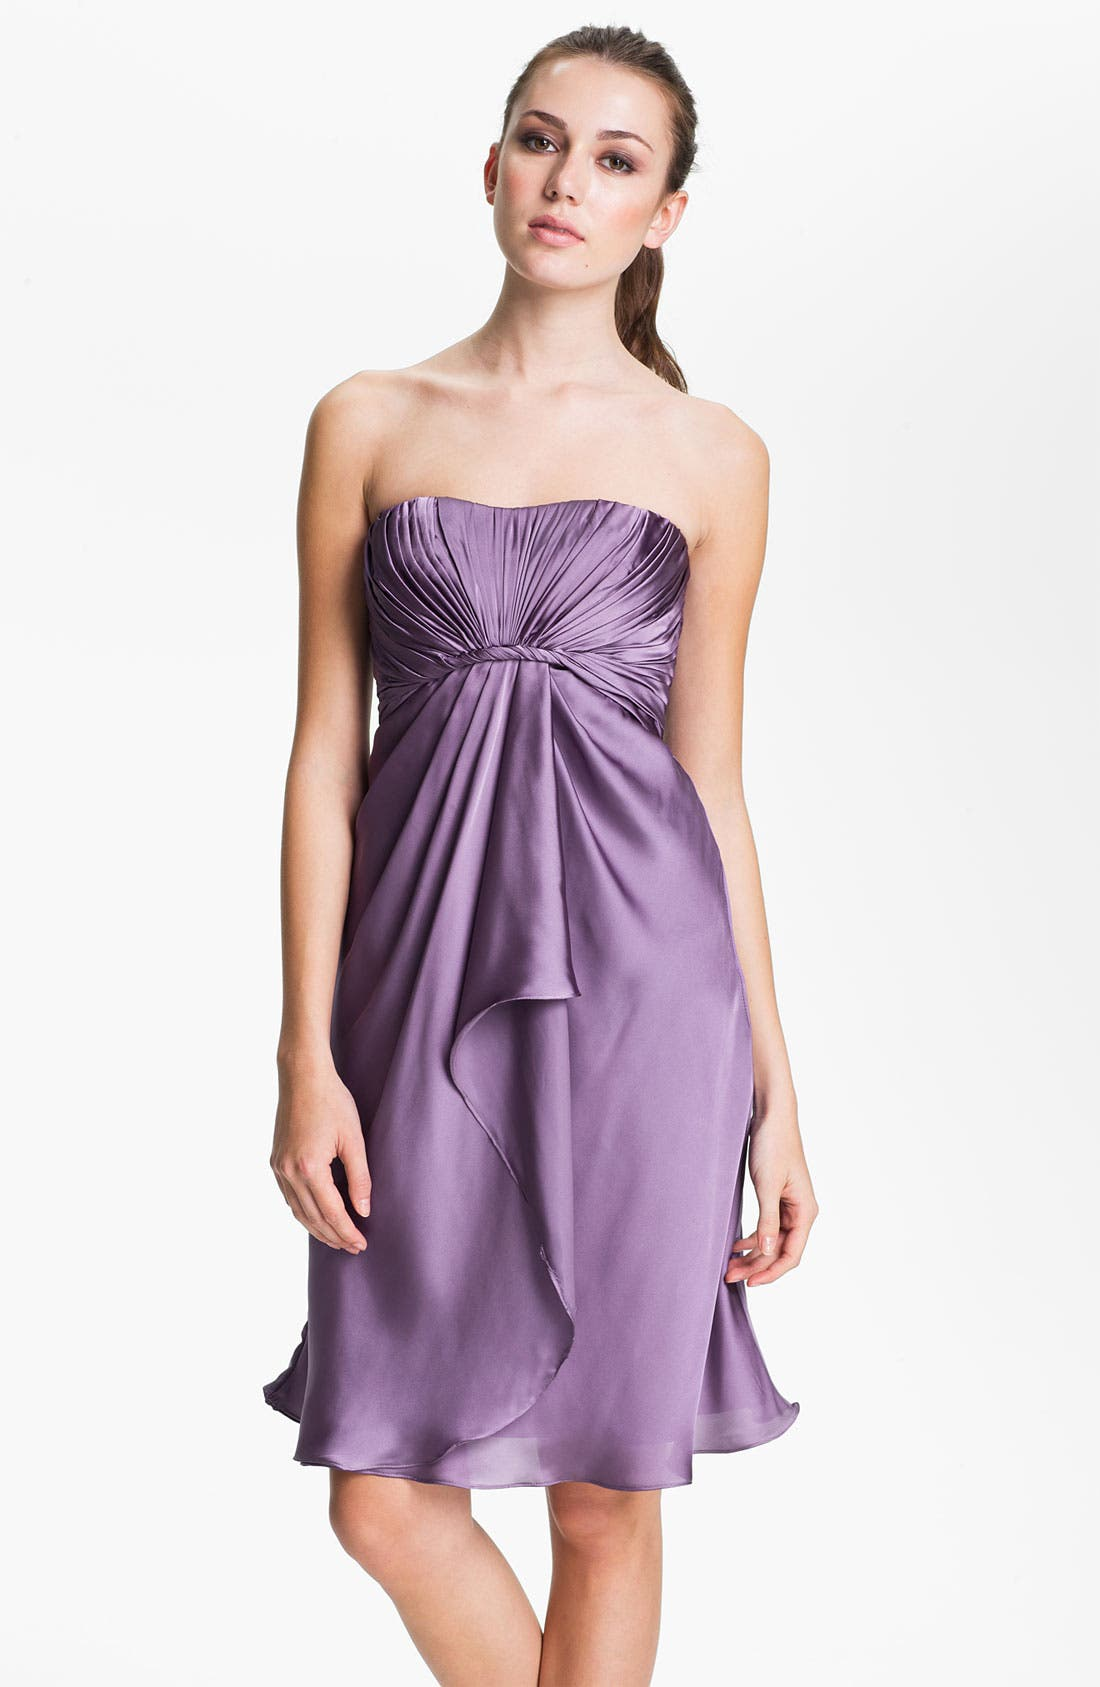 Alternate Image 1 Selected - ML Monique Lhuillier Bridesmaids Strapless Drape Detail Charmeuse Dress (Nordstrom Exclusive)